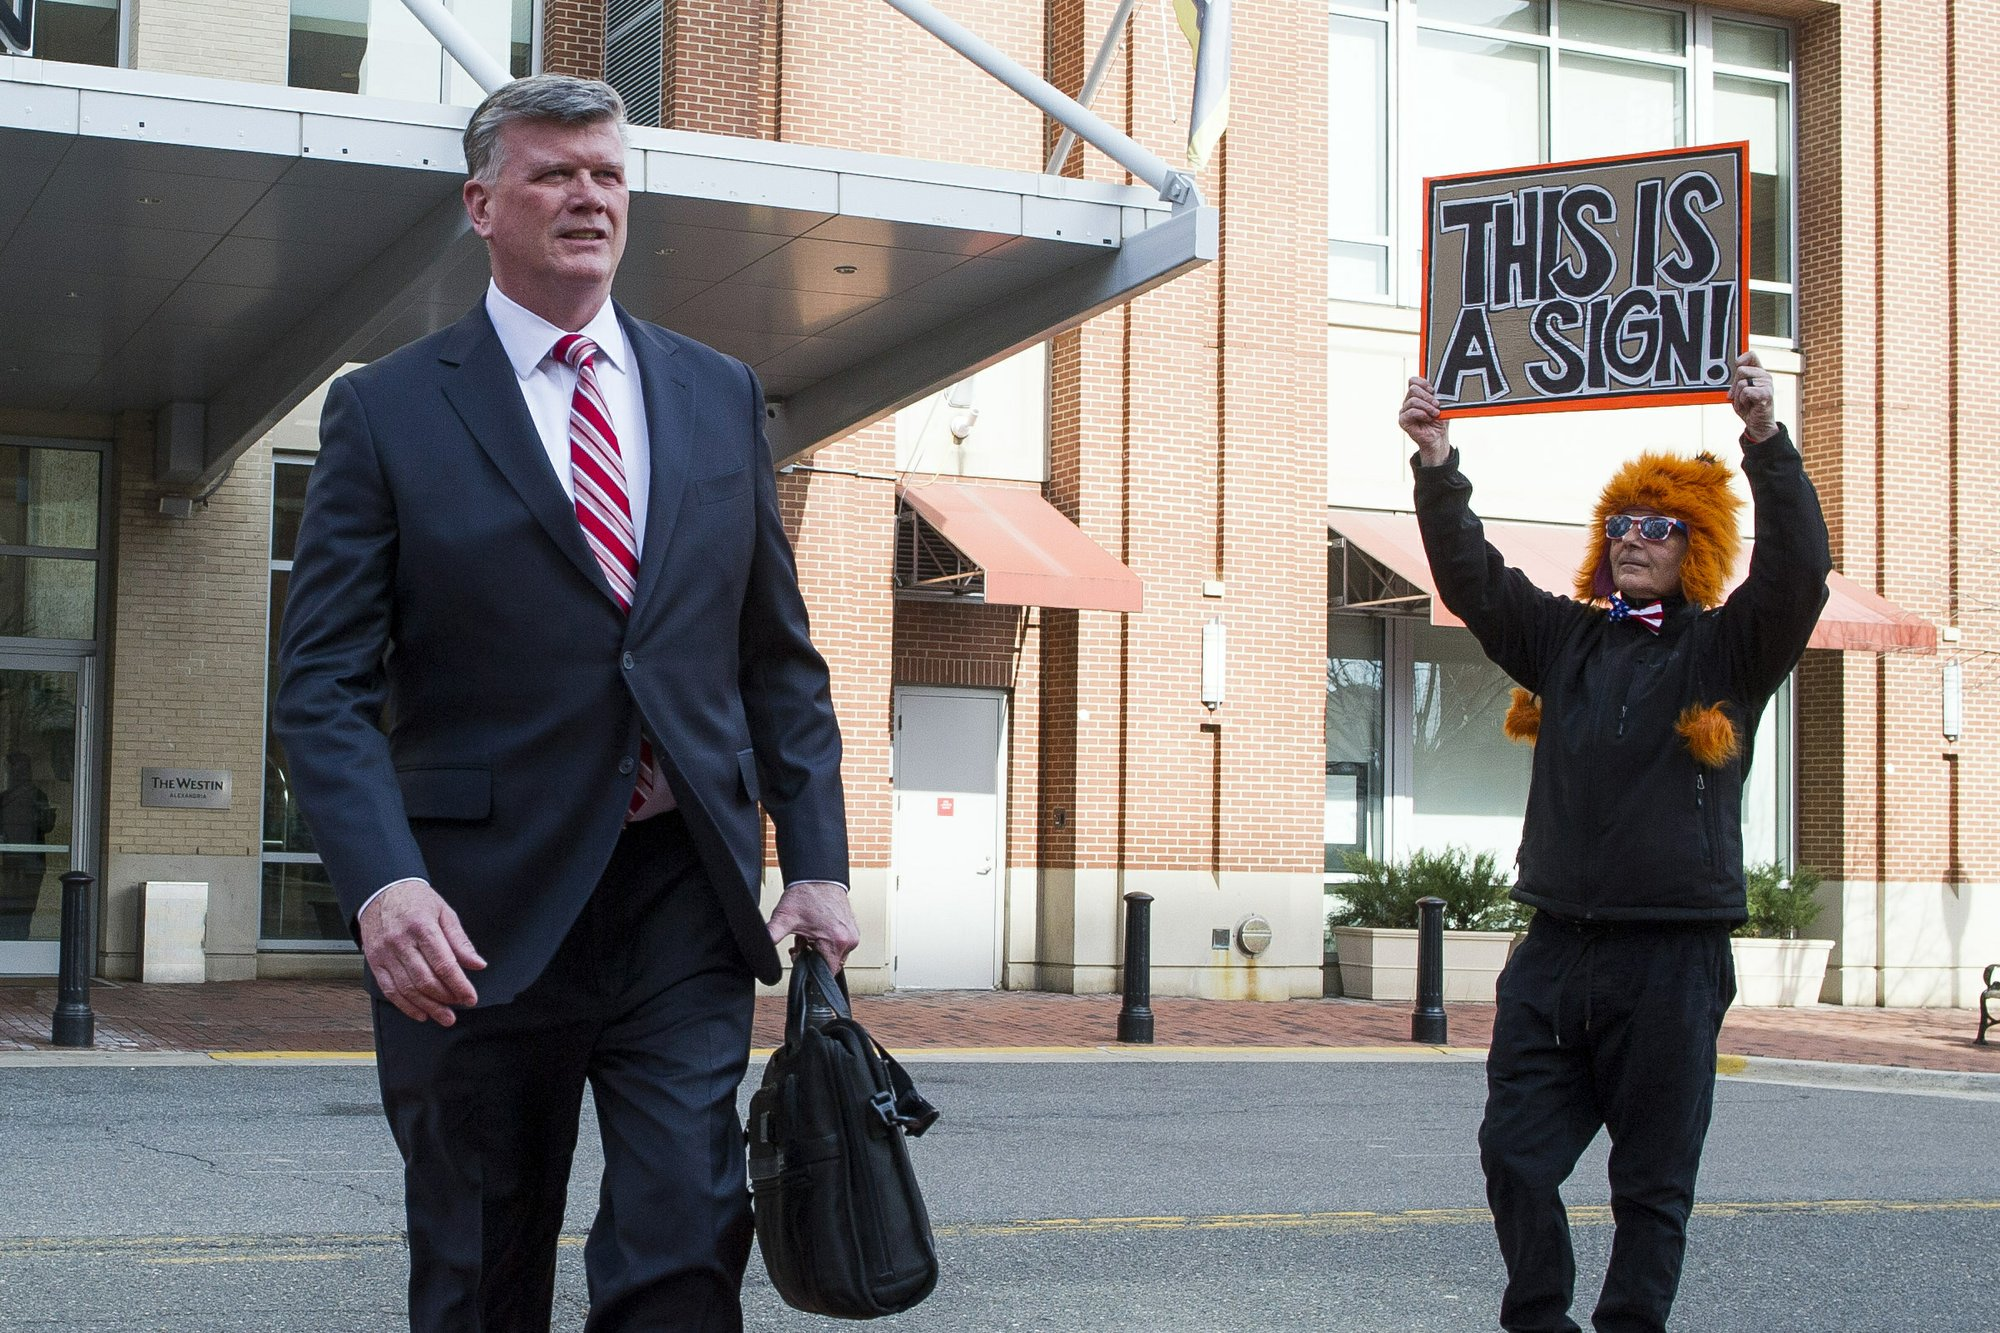 Manafort asks for compassion before sentencing